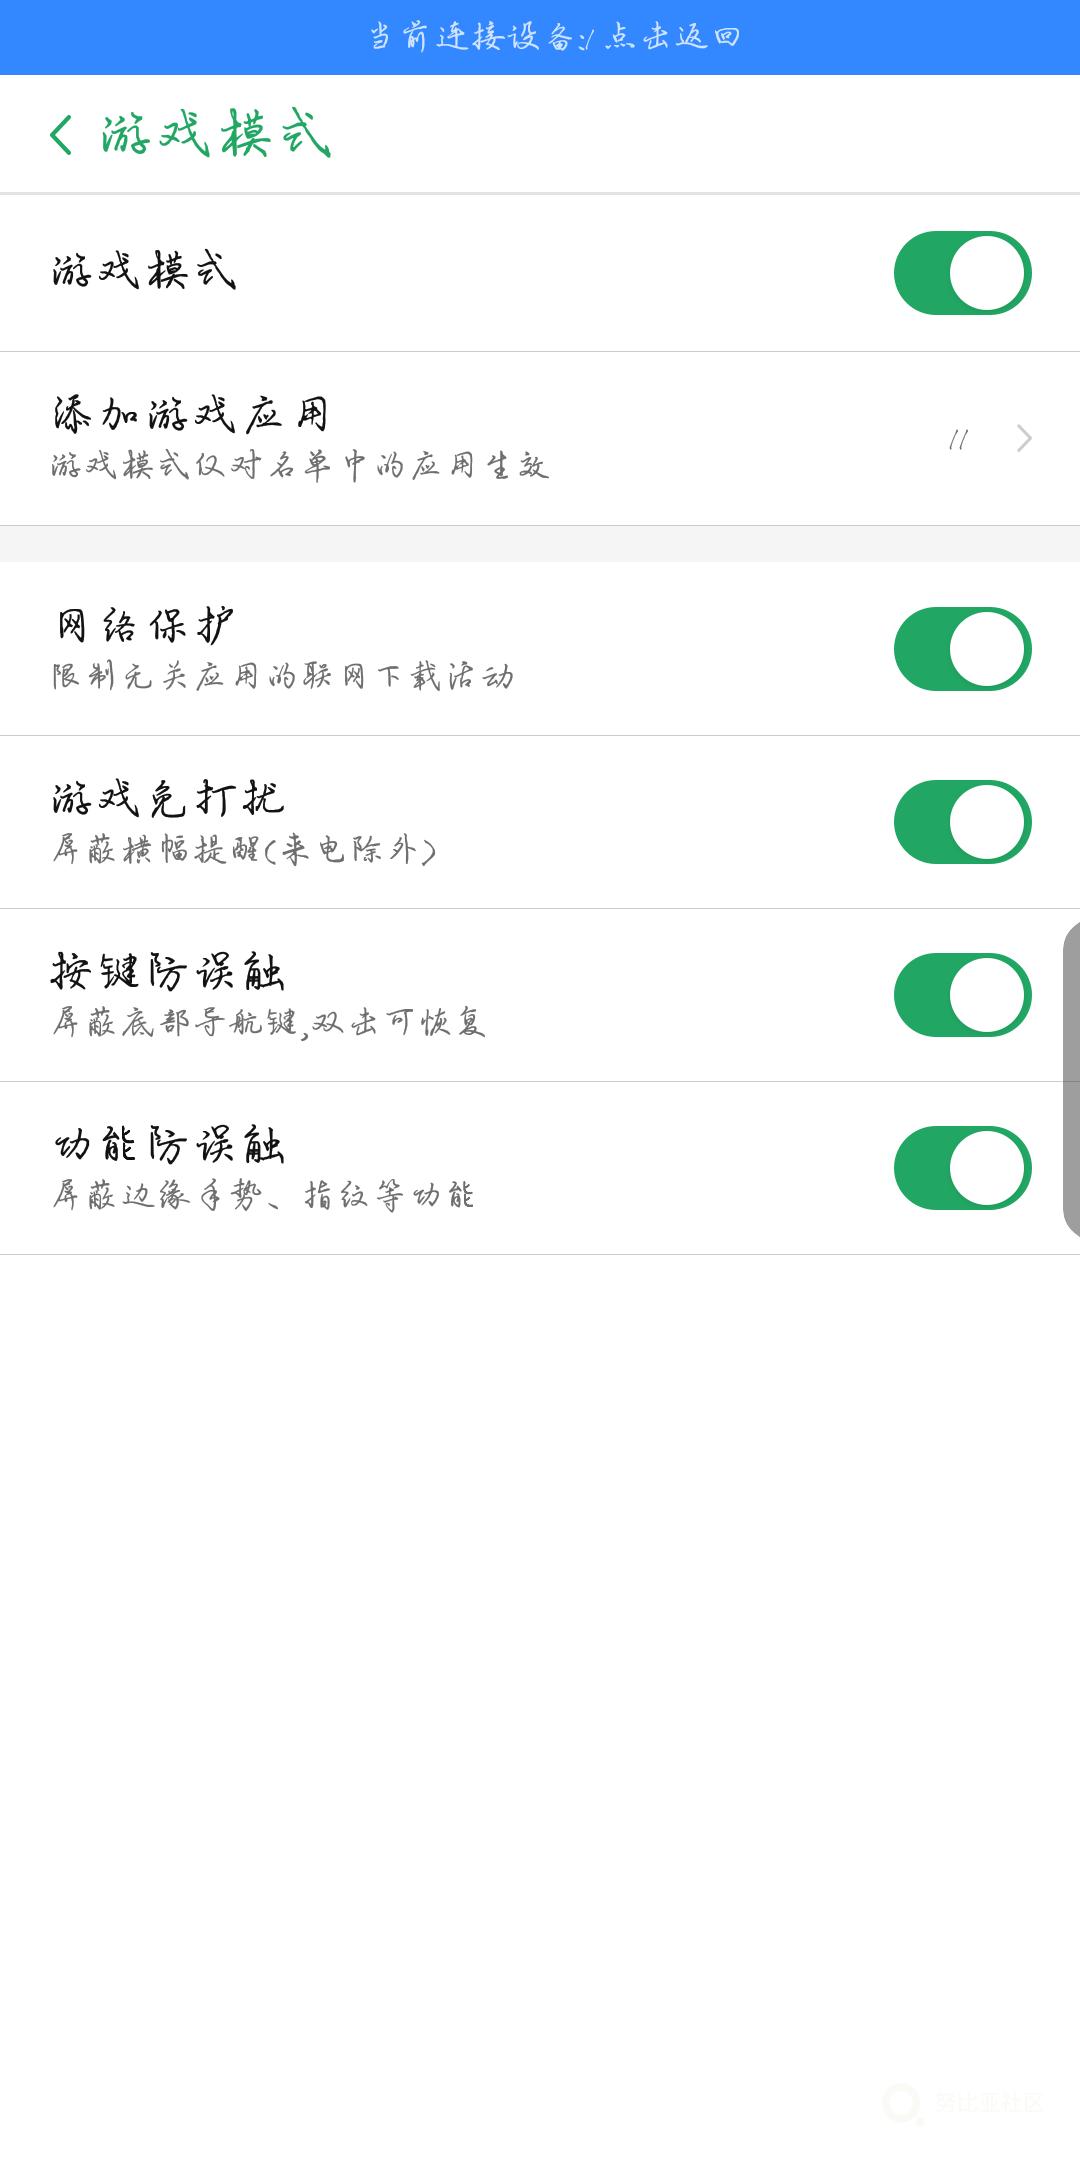 Screenshot_2018-05-02-21-11-59.png